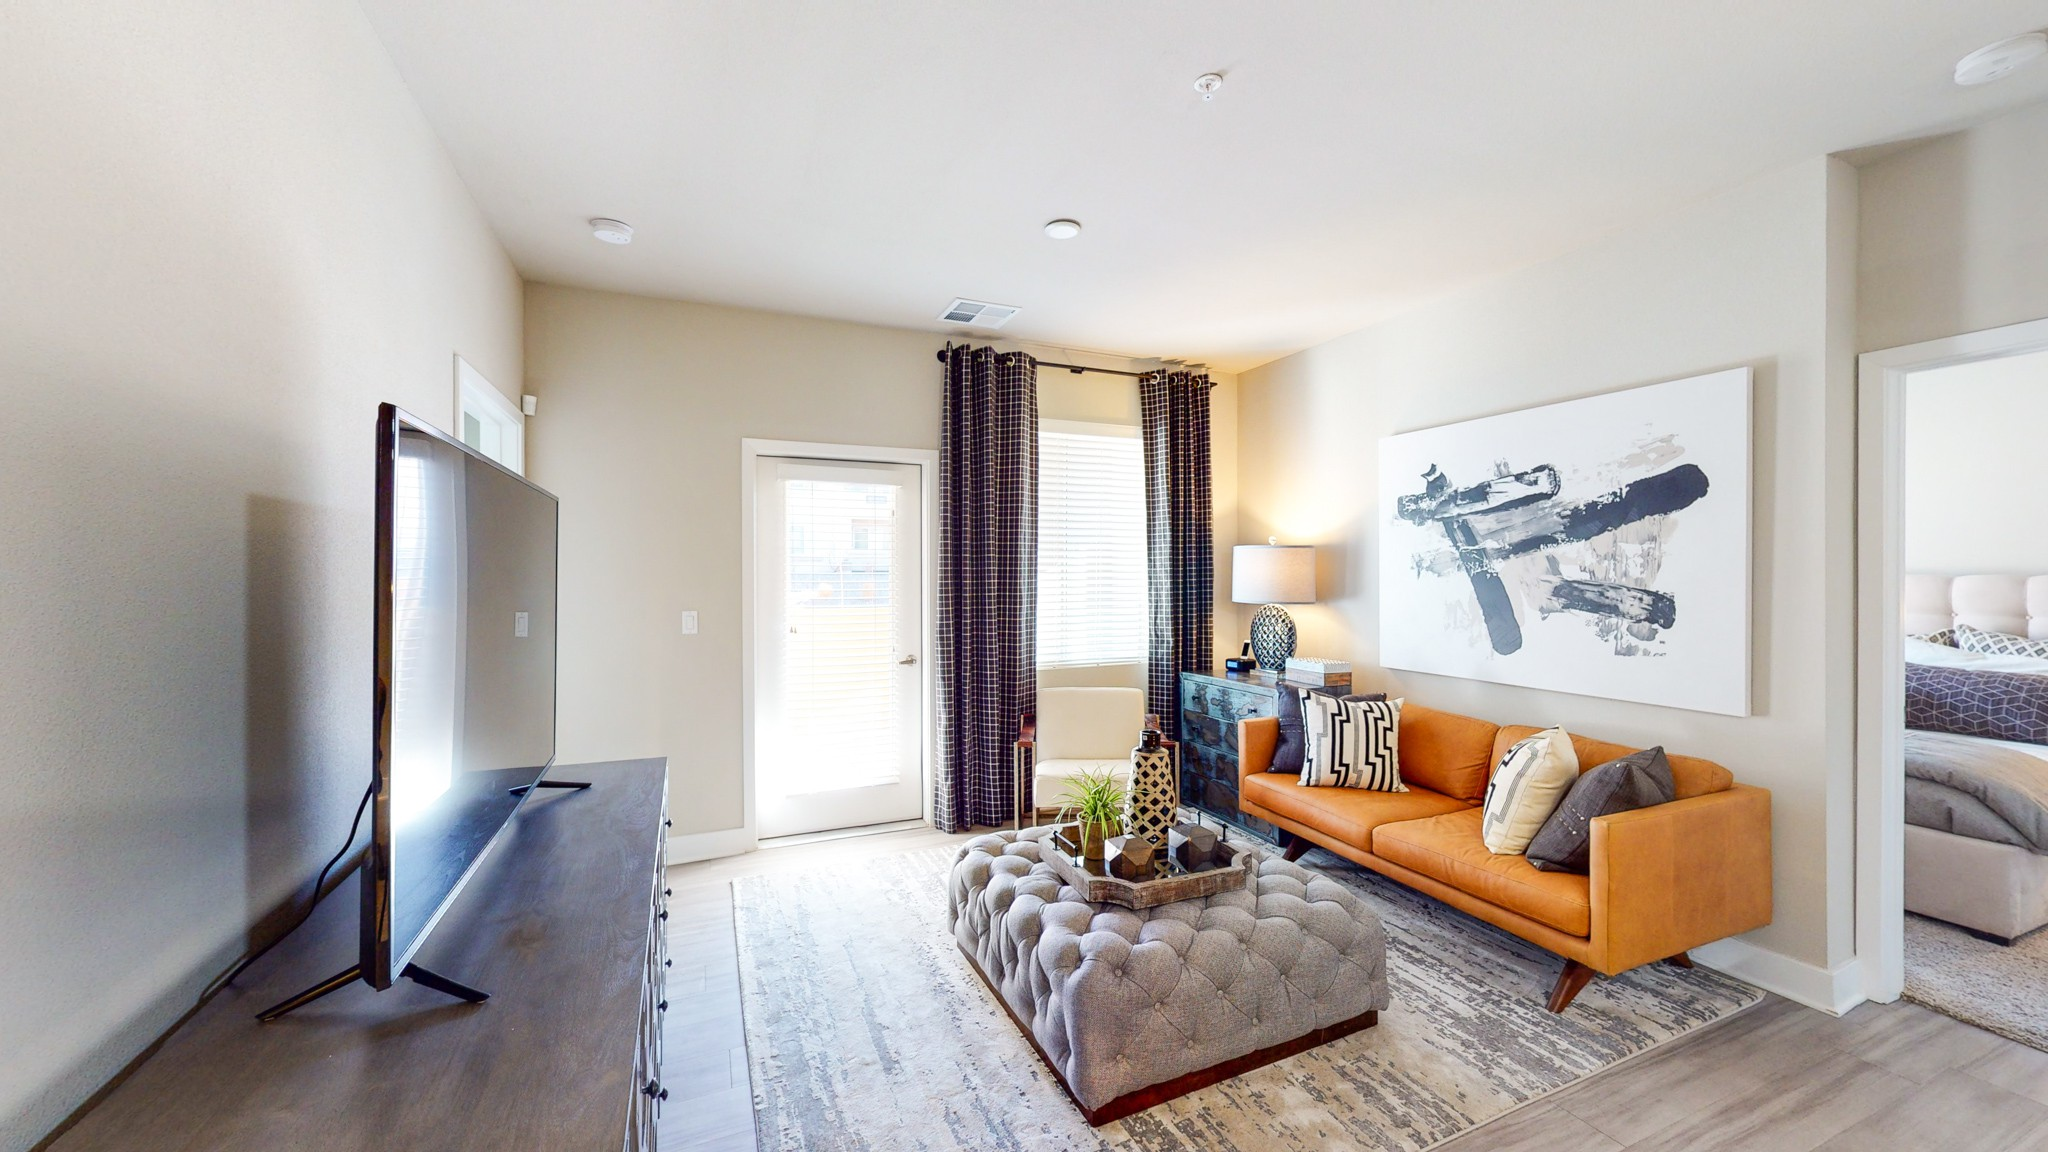 Apartments Near Albuquerque Olympus Northpoint for Albuquerque Students in Albuquerque, NM